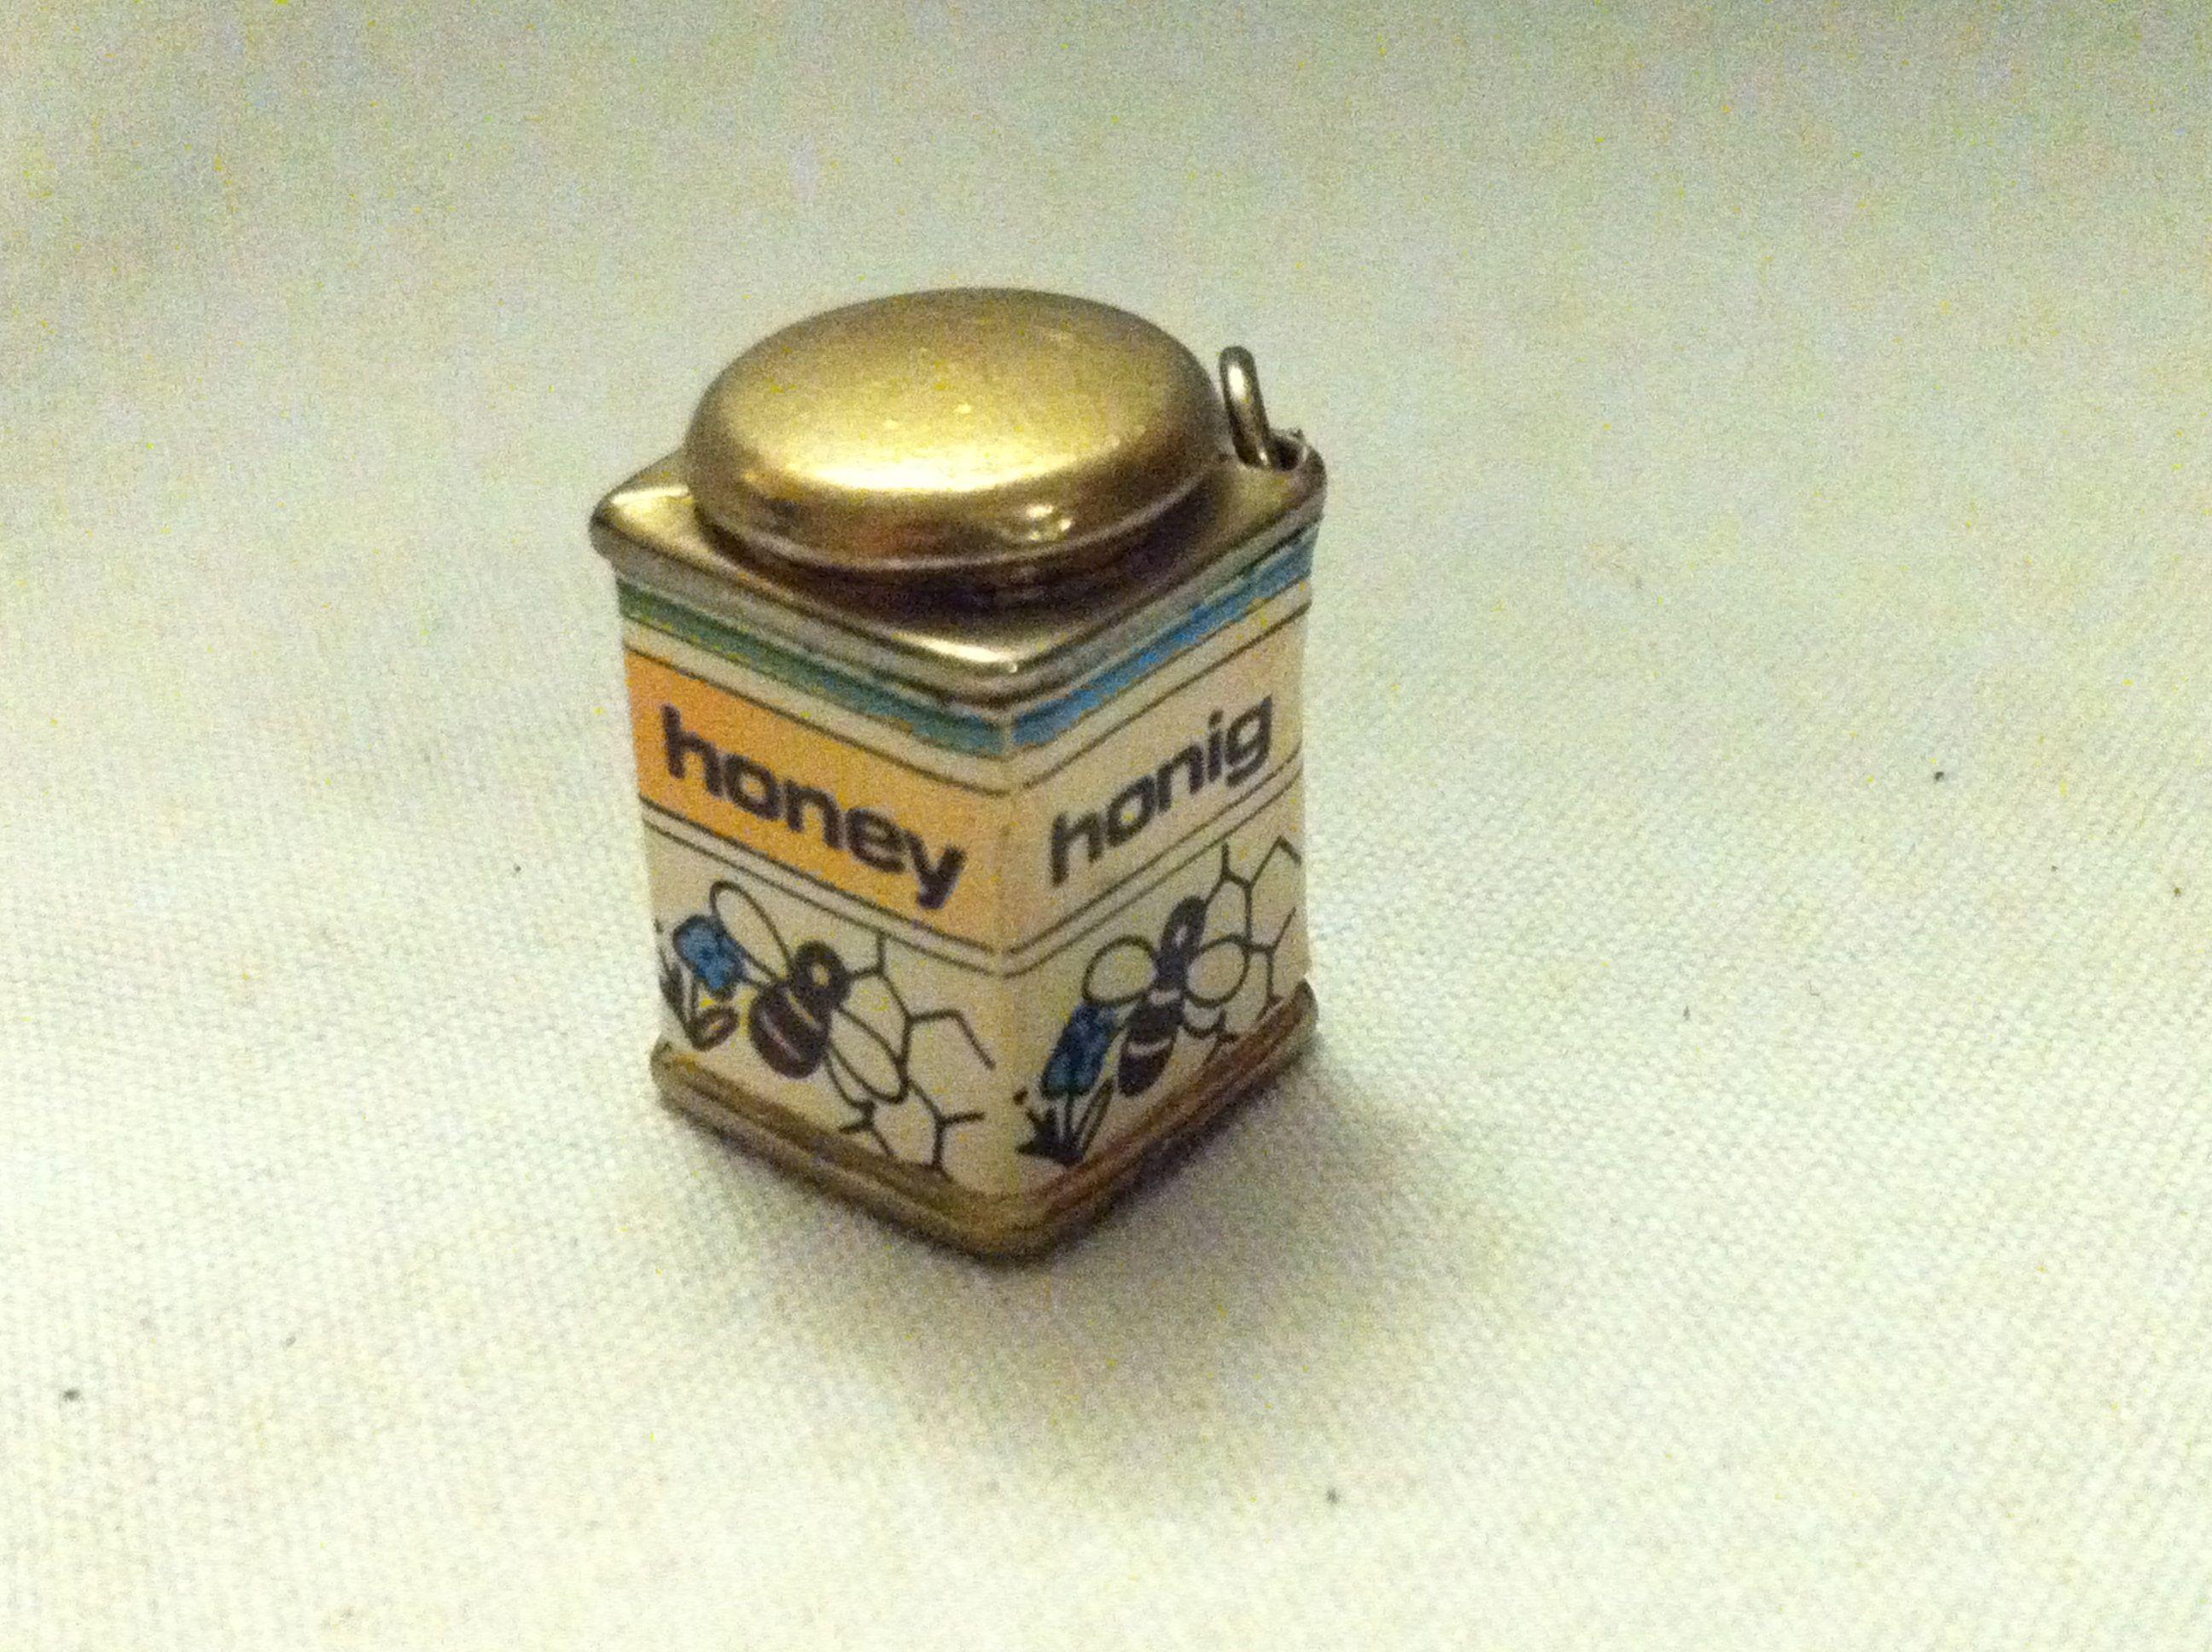 Antike Puppenstuben Accessoires Honig Dose Deko Objekt Miniatur